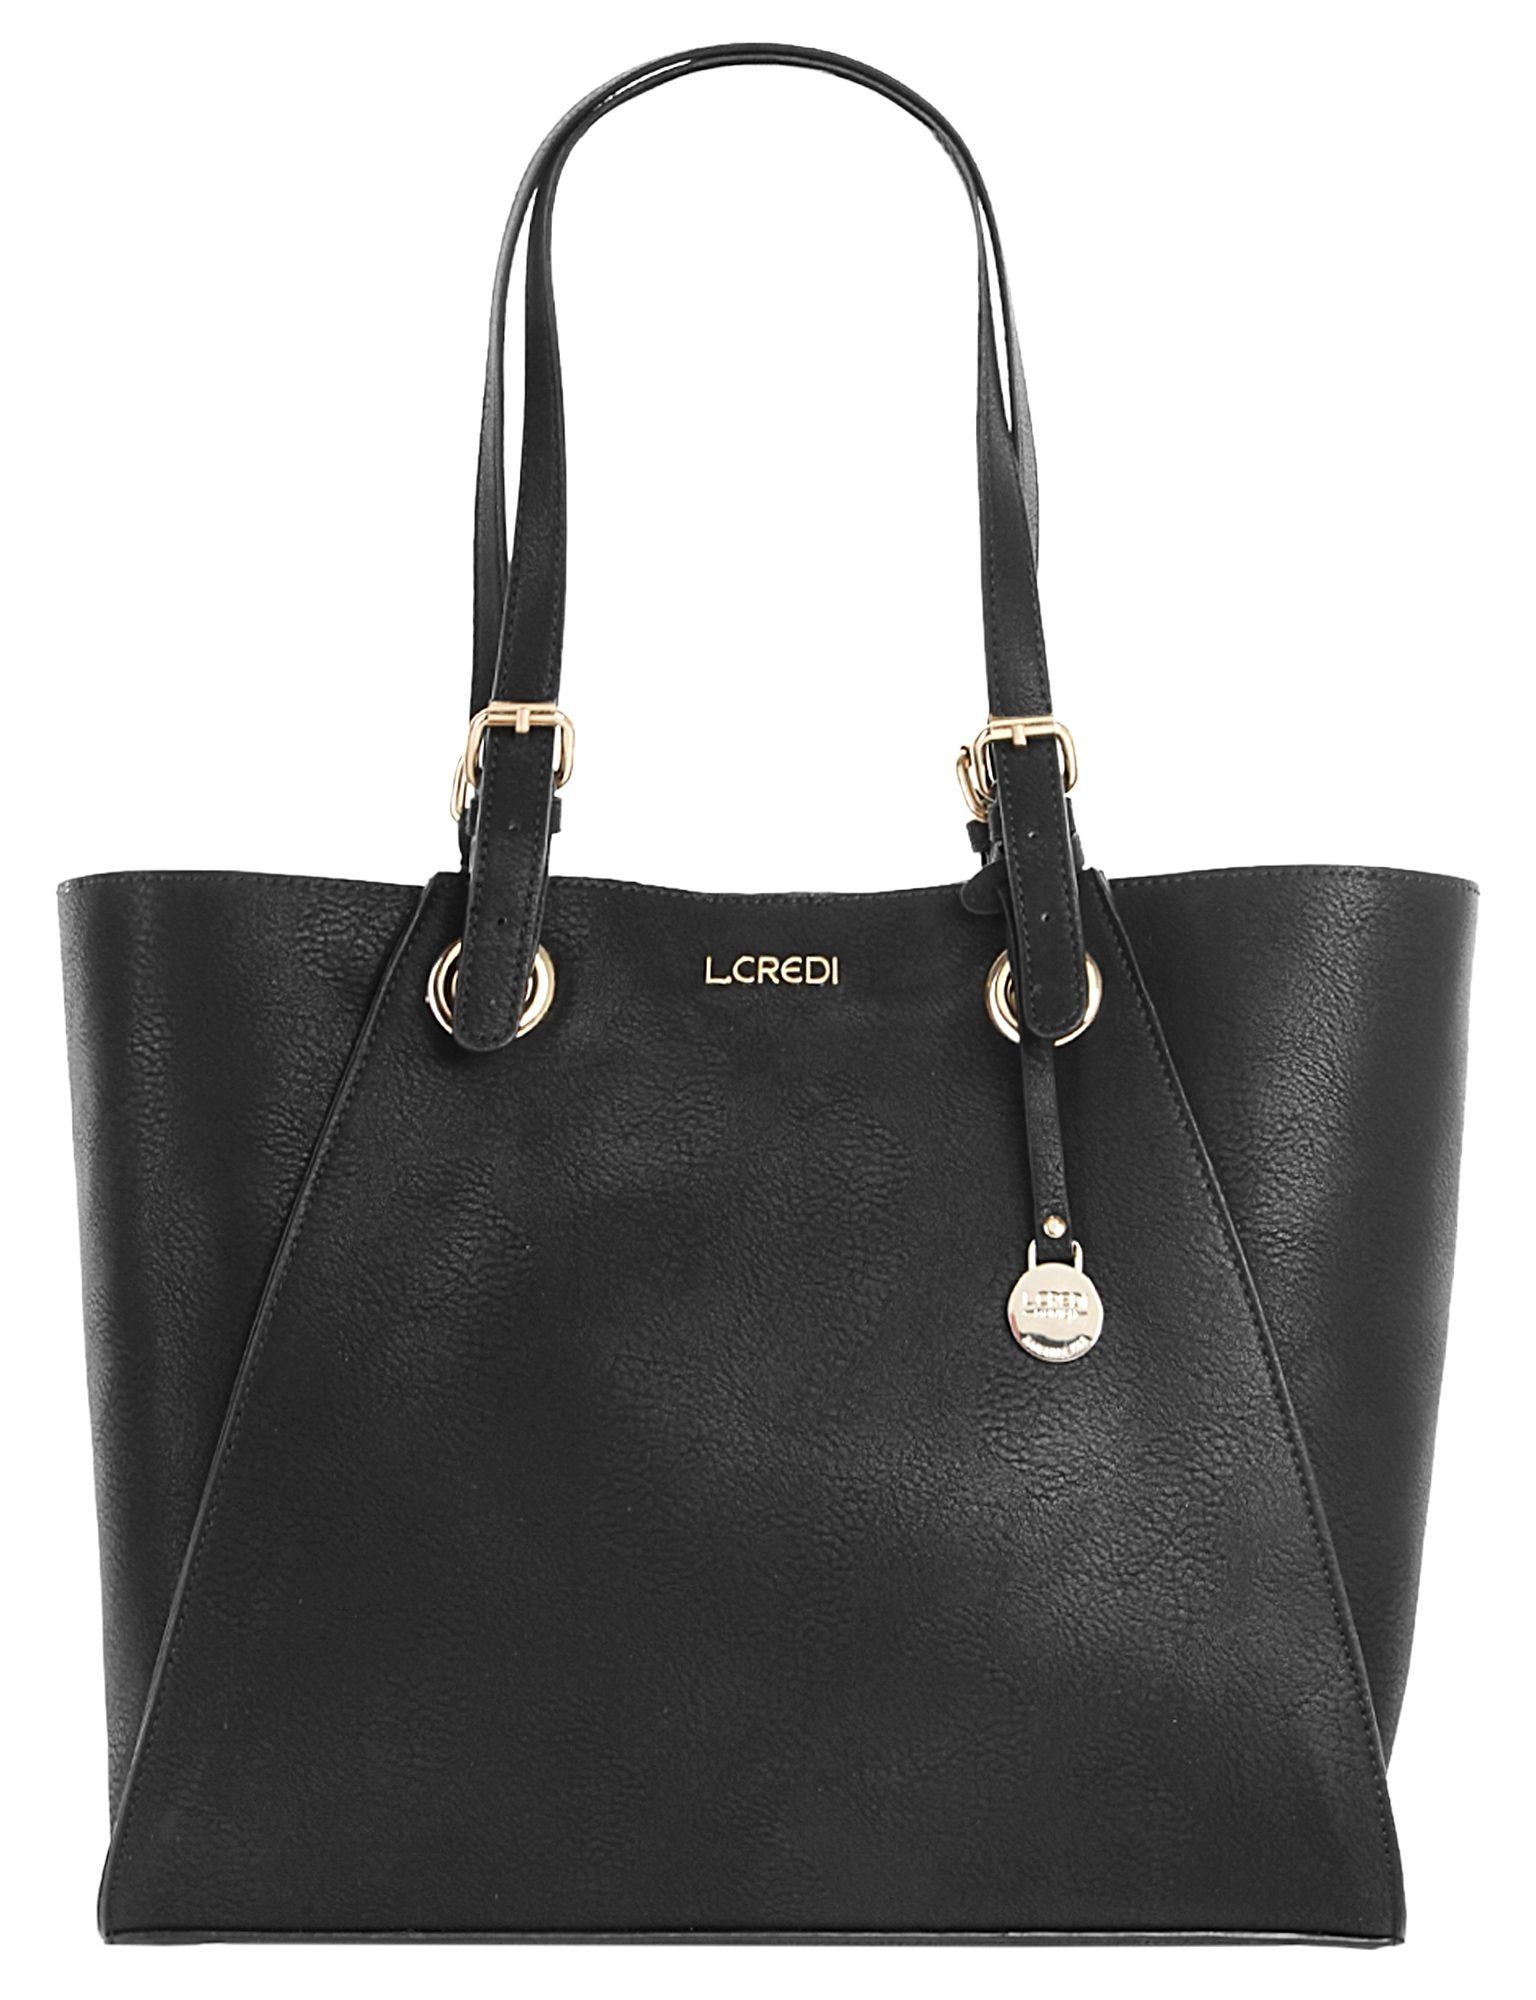 L.Credi Damen Handtasche »Helene«